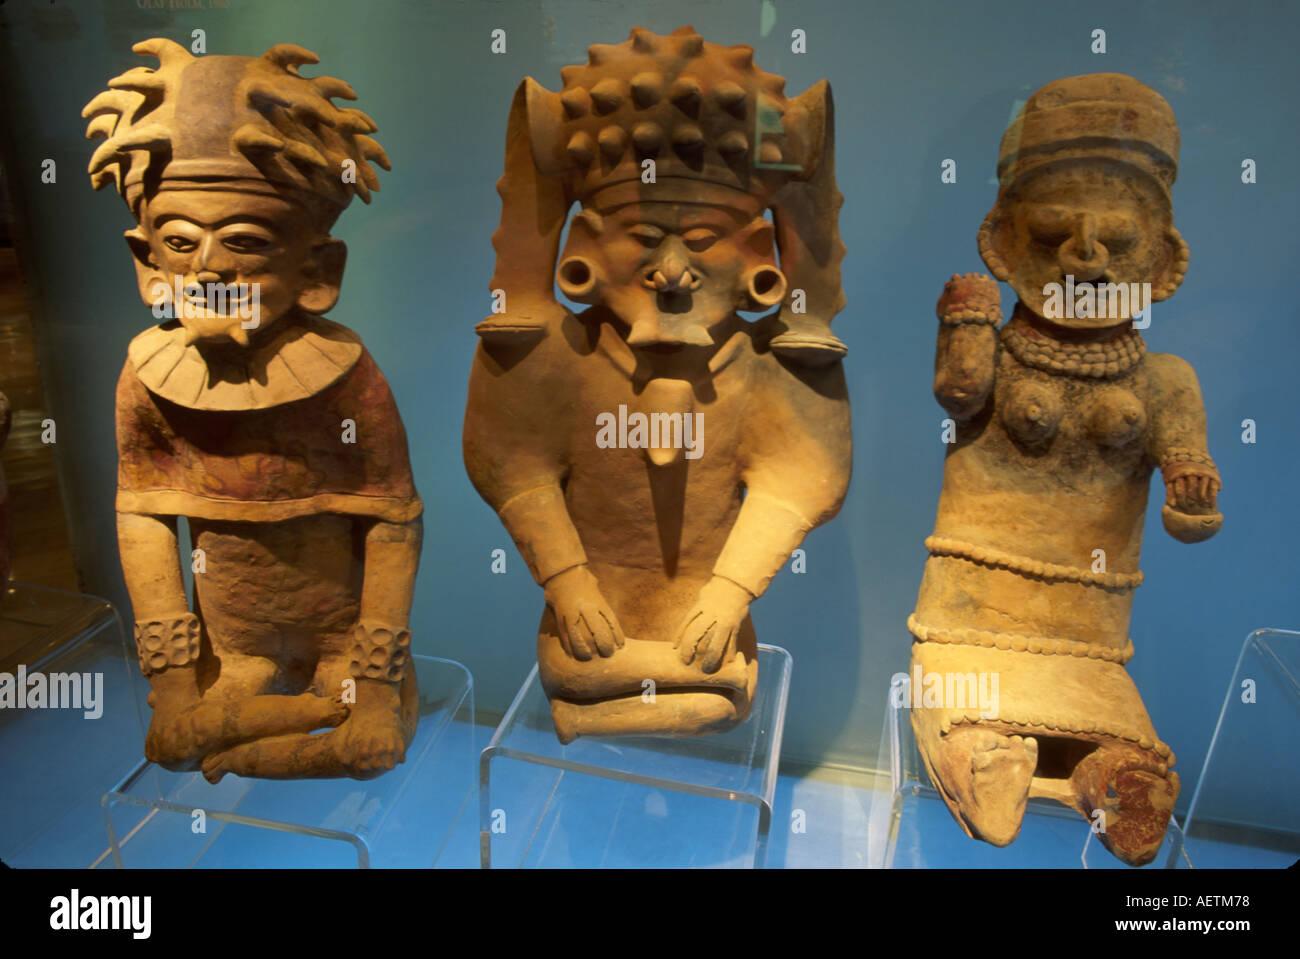 Image result for ecuador artifacts